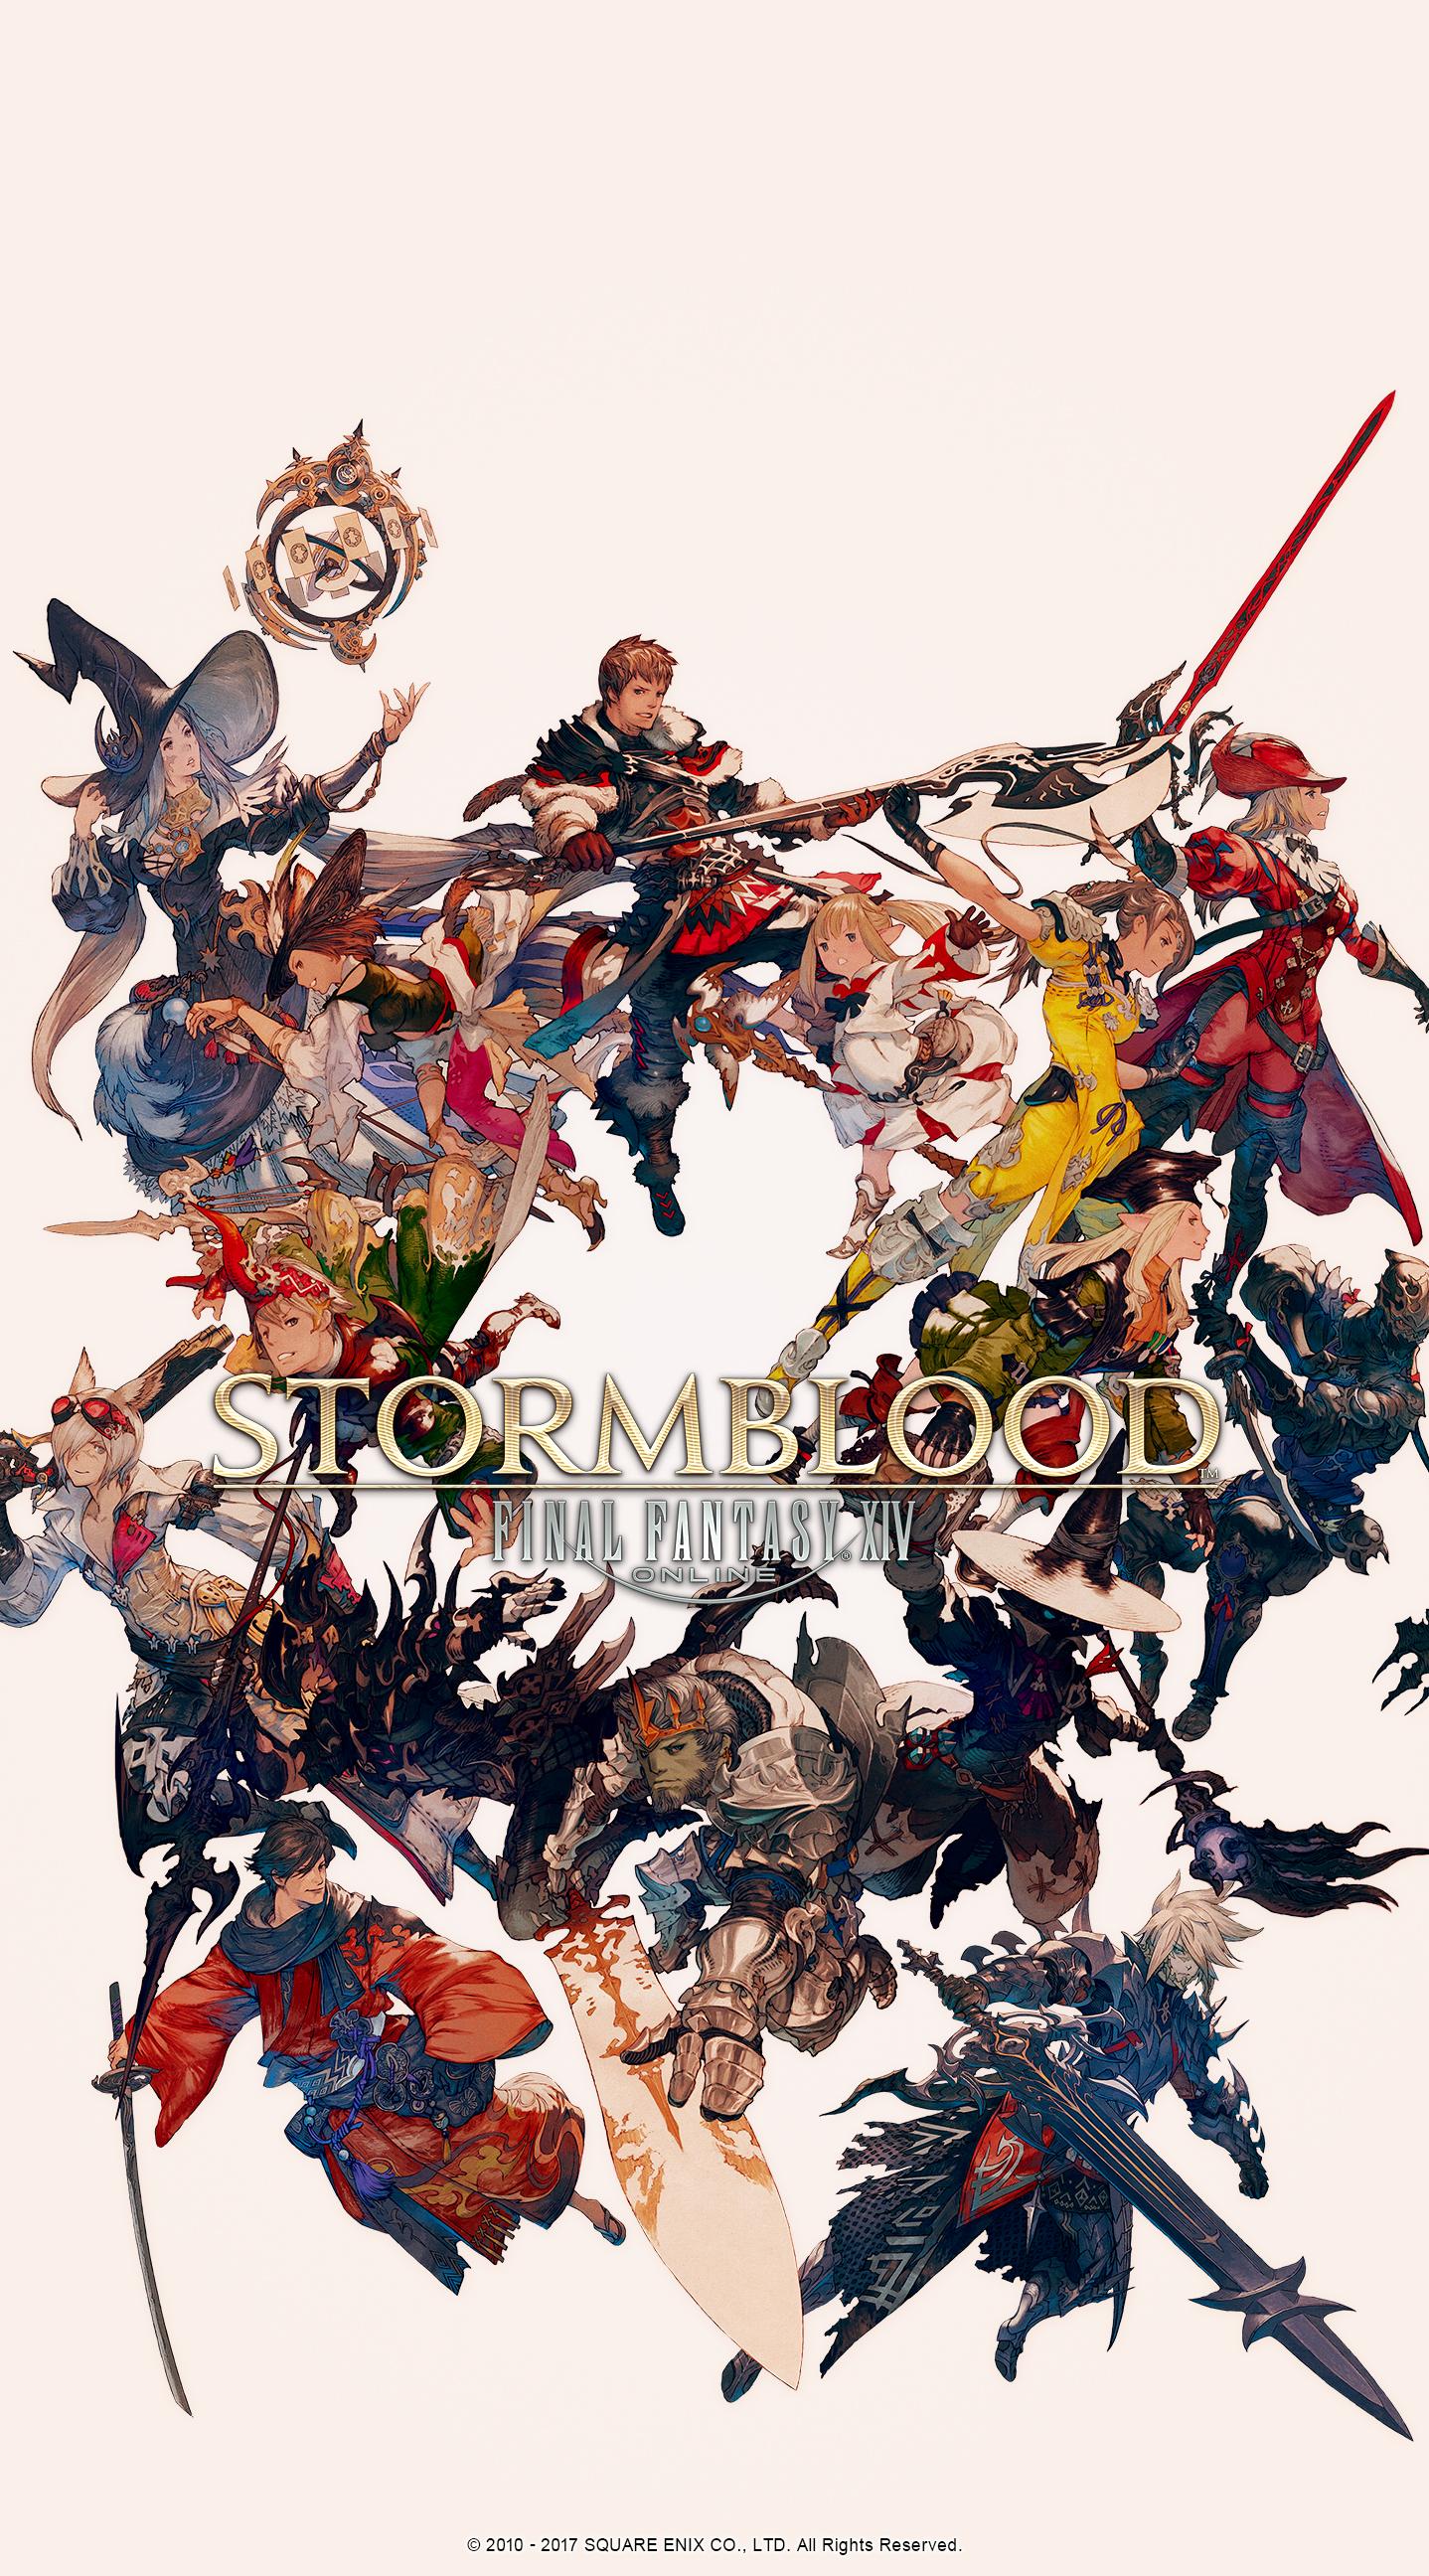 Ffxiv ファンキット追加 Final Fantasy Xiv The Lodestone